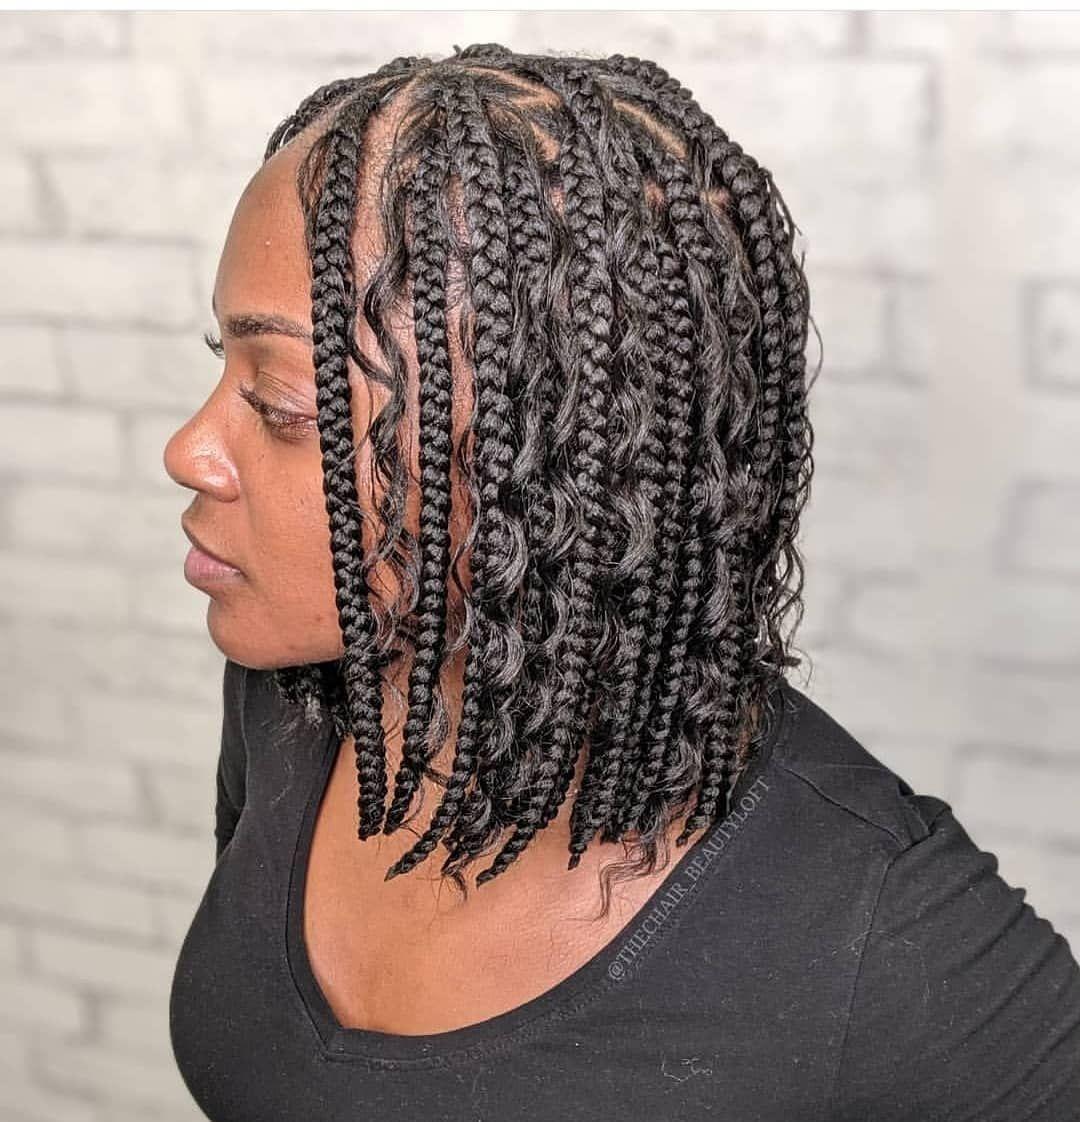 2020 Braided Hairstyles : Wonderful Newest Hair Developments in 2020 | Braided hairstyles easy ...